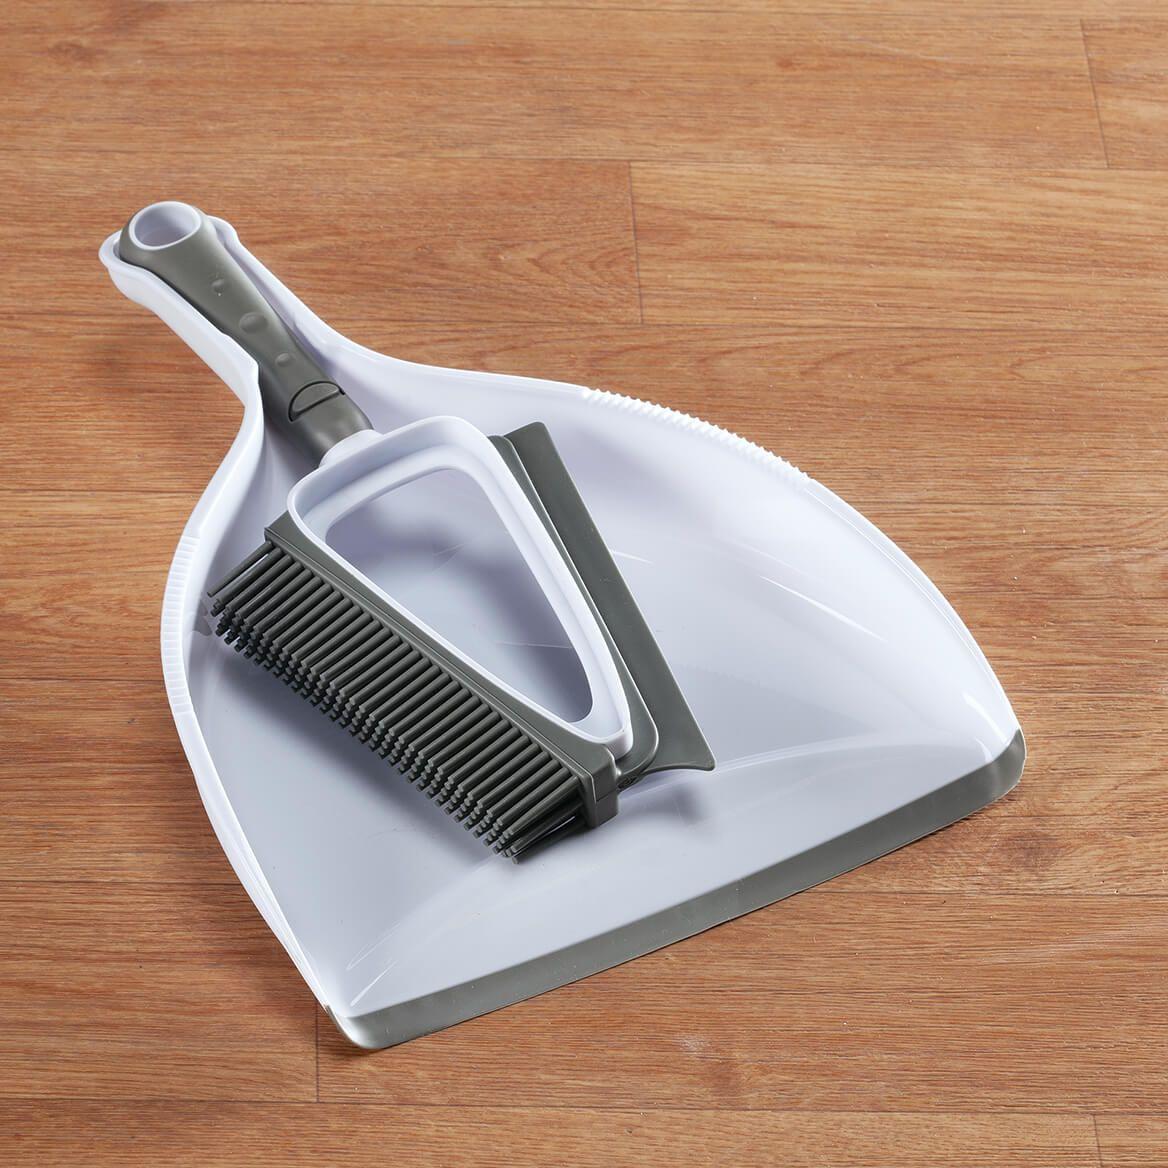 Wet/Dry Dustpan and Brush Set-371967